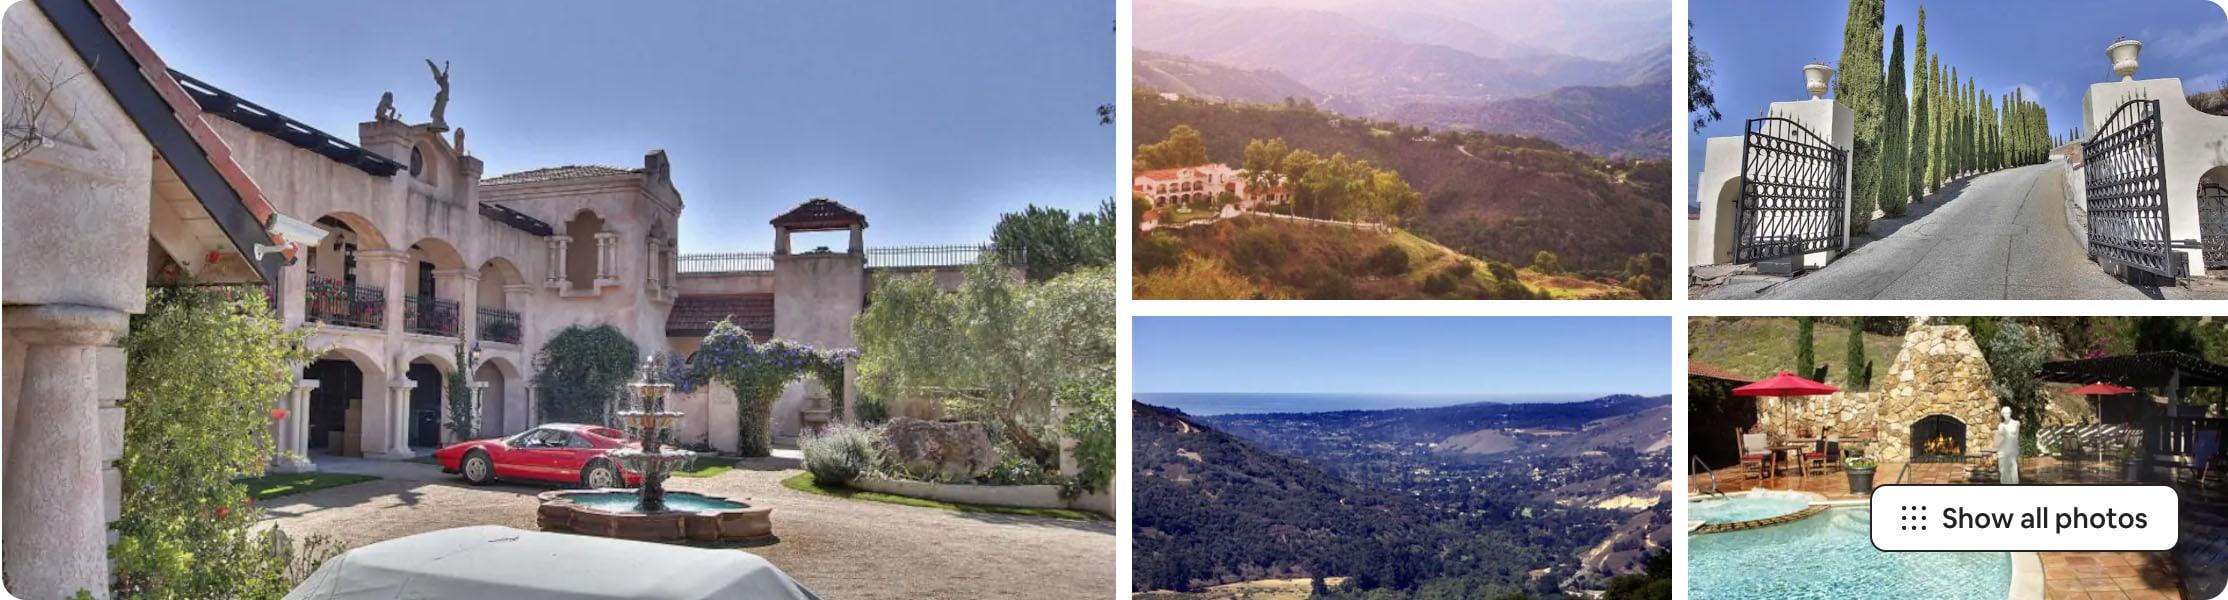 carmel valley airbnb